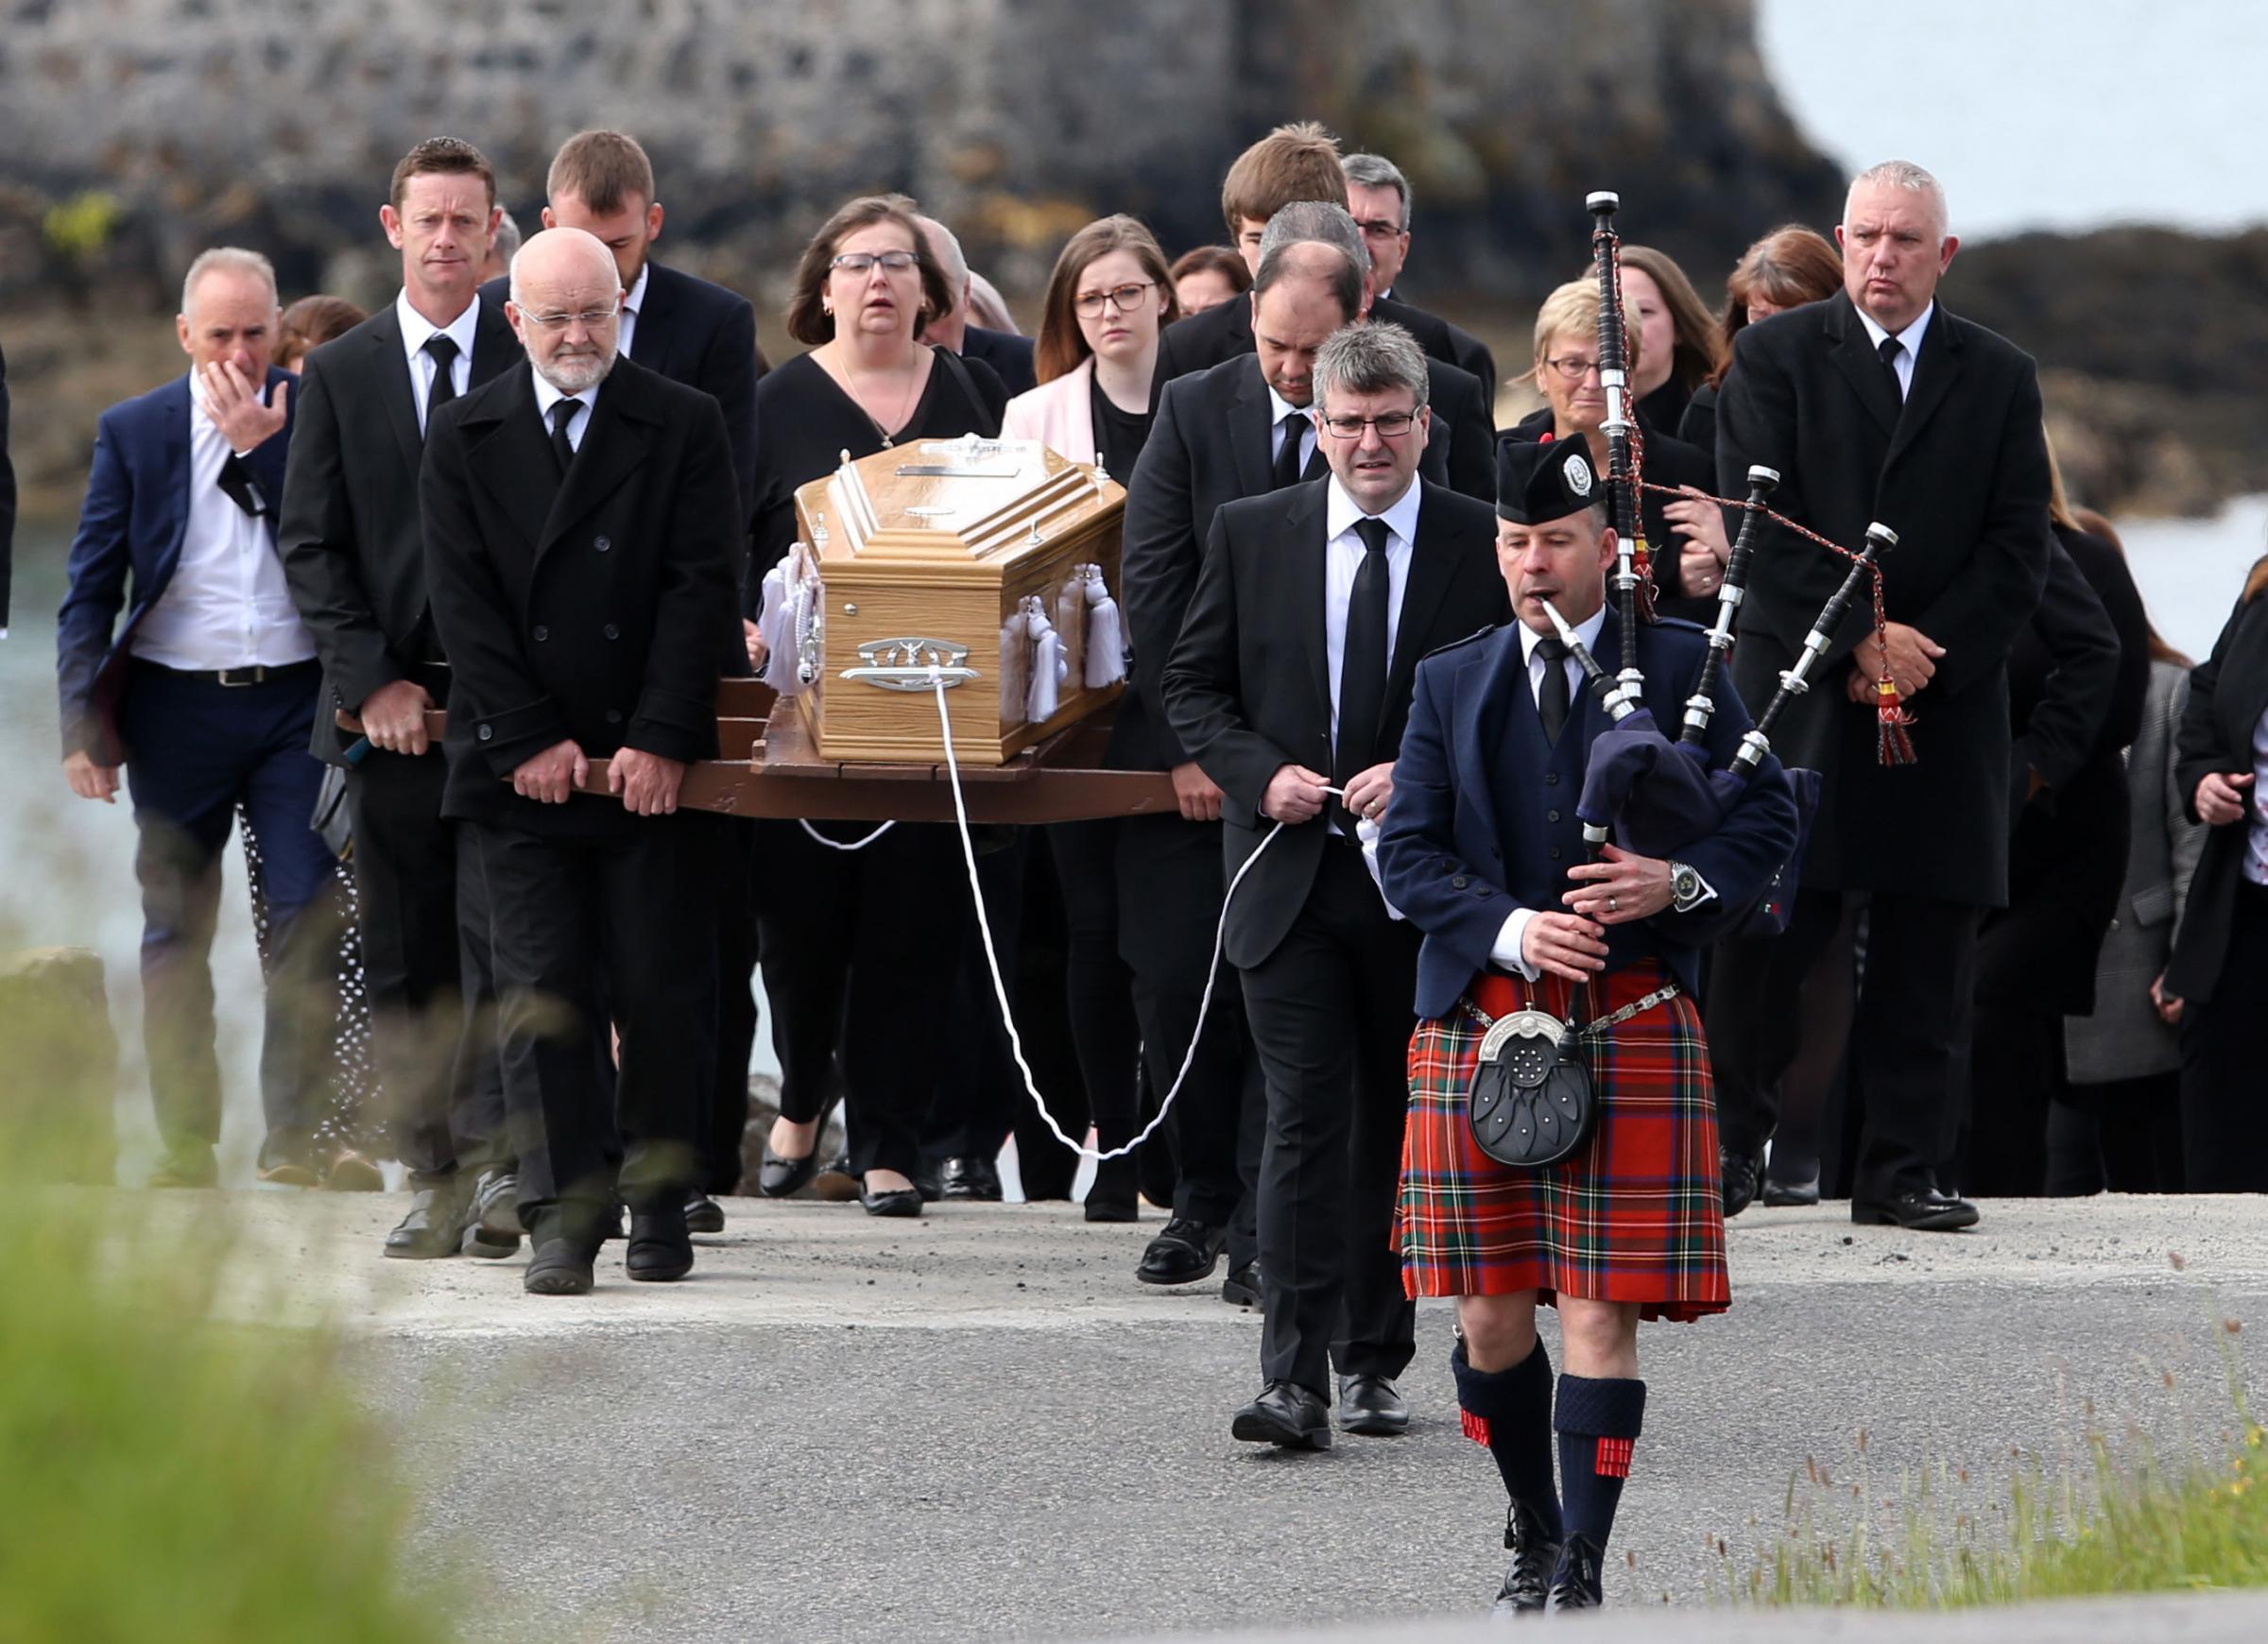 Scottish bagpiper leads funeral procession